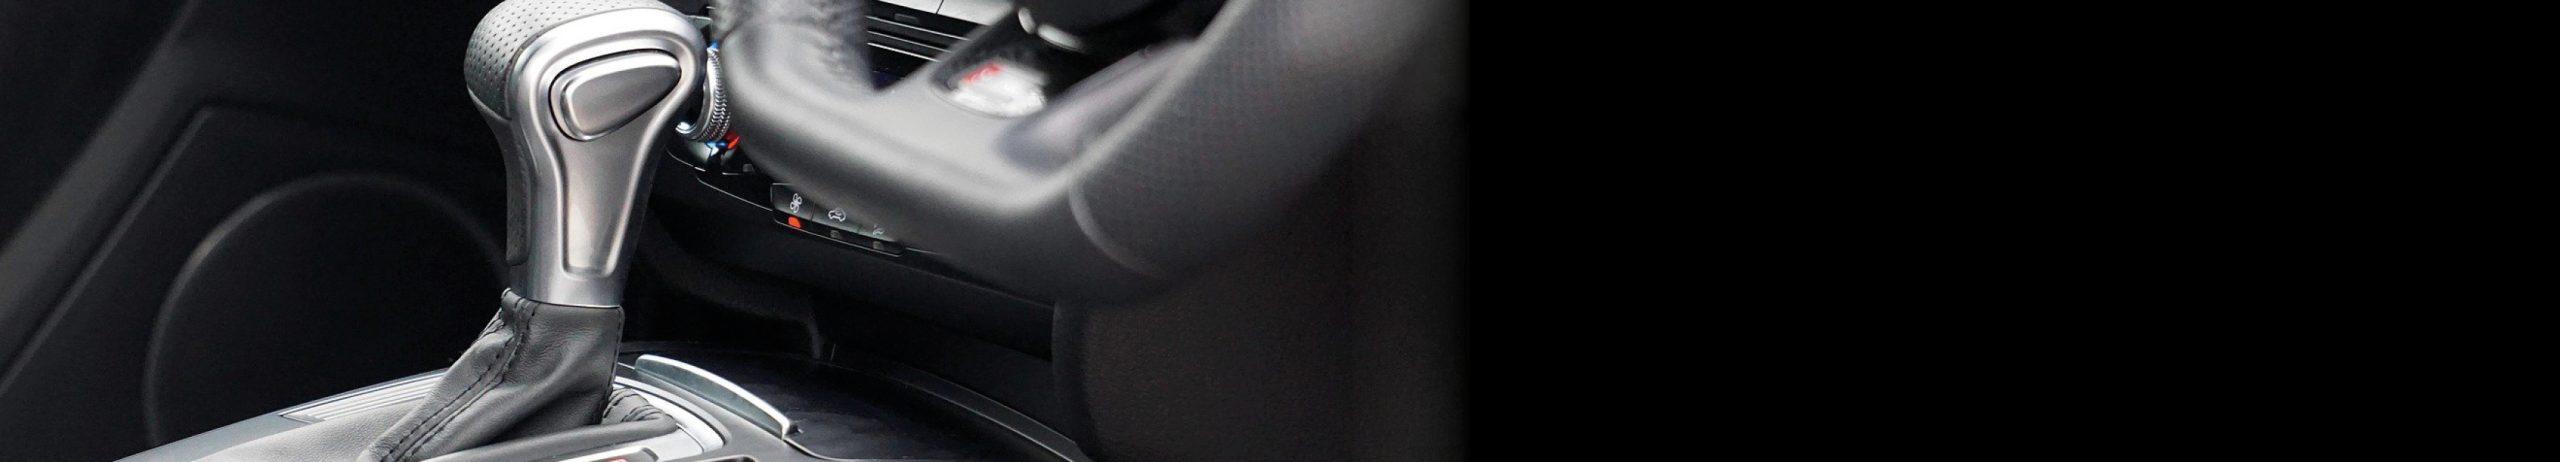 KB_Sliderbild_Fahrzeugdesinfektion